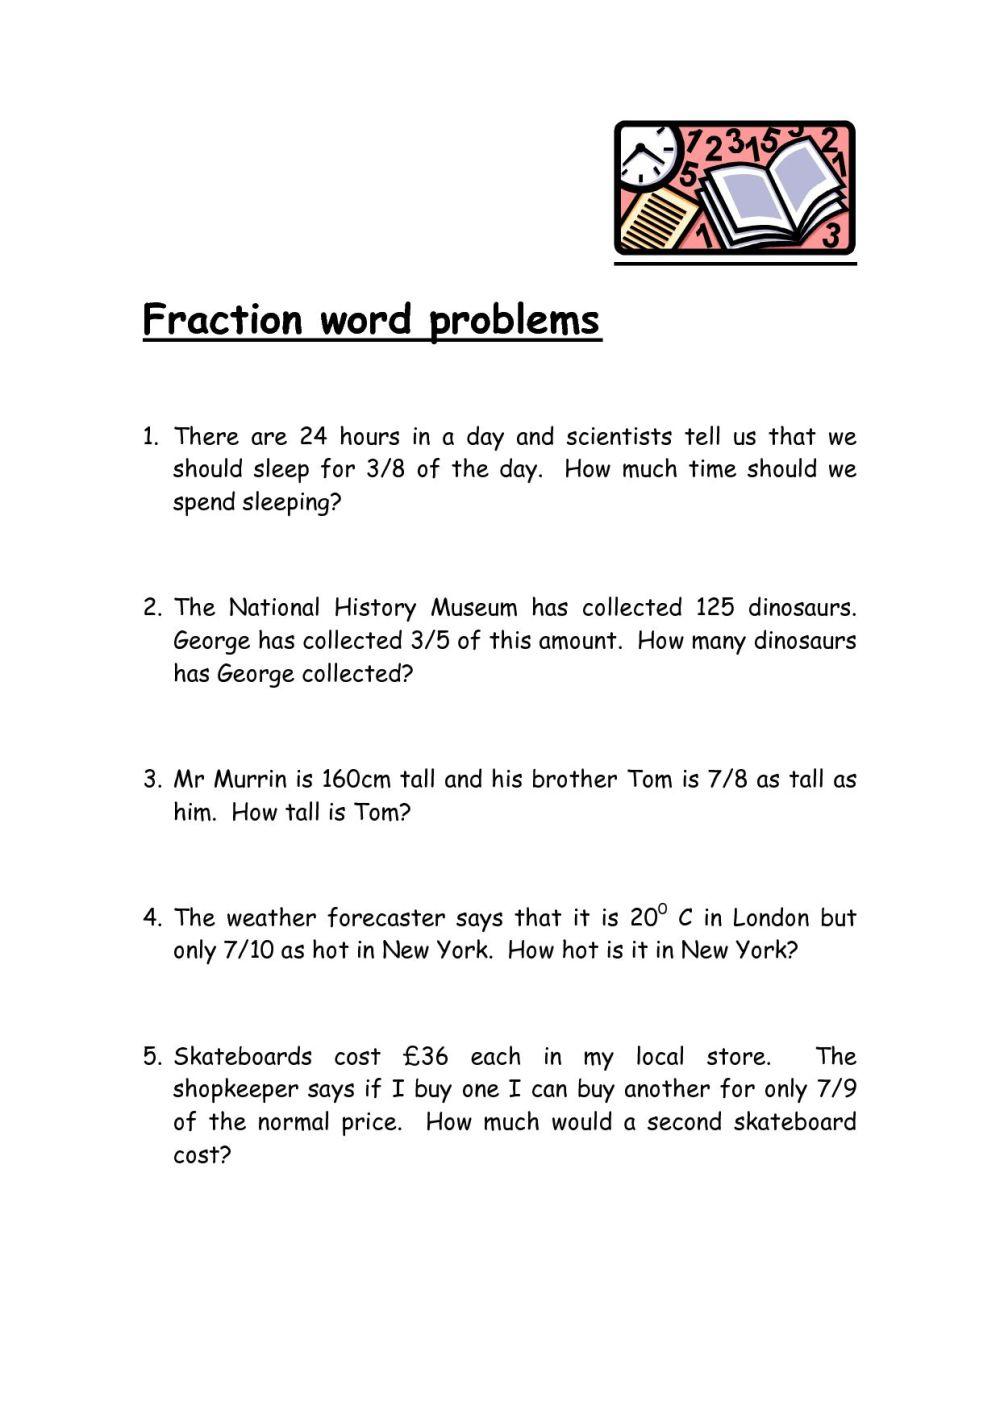 medium resolution of Multiplying Decimals Worksheet 5th Grade   Printable Worksheets and  Activities for Teachers